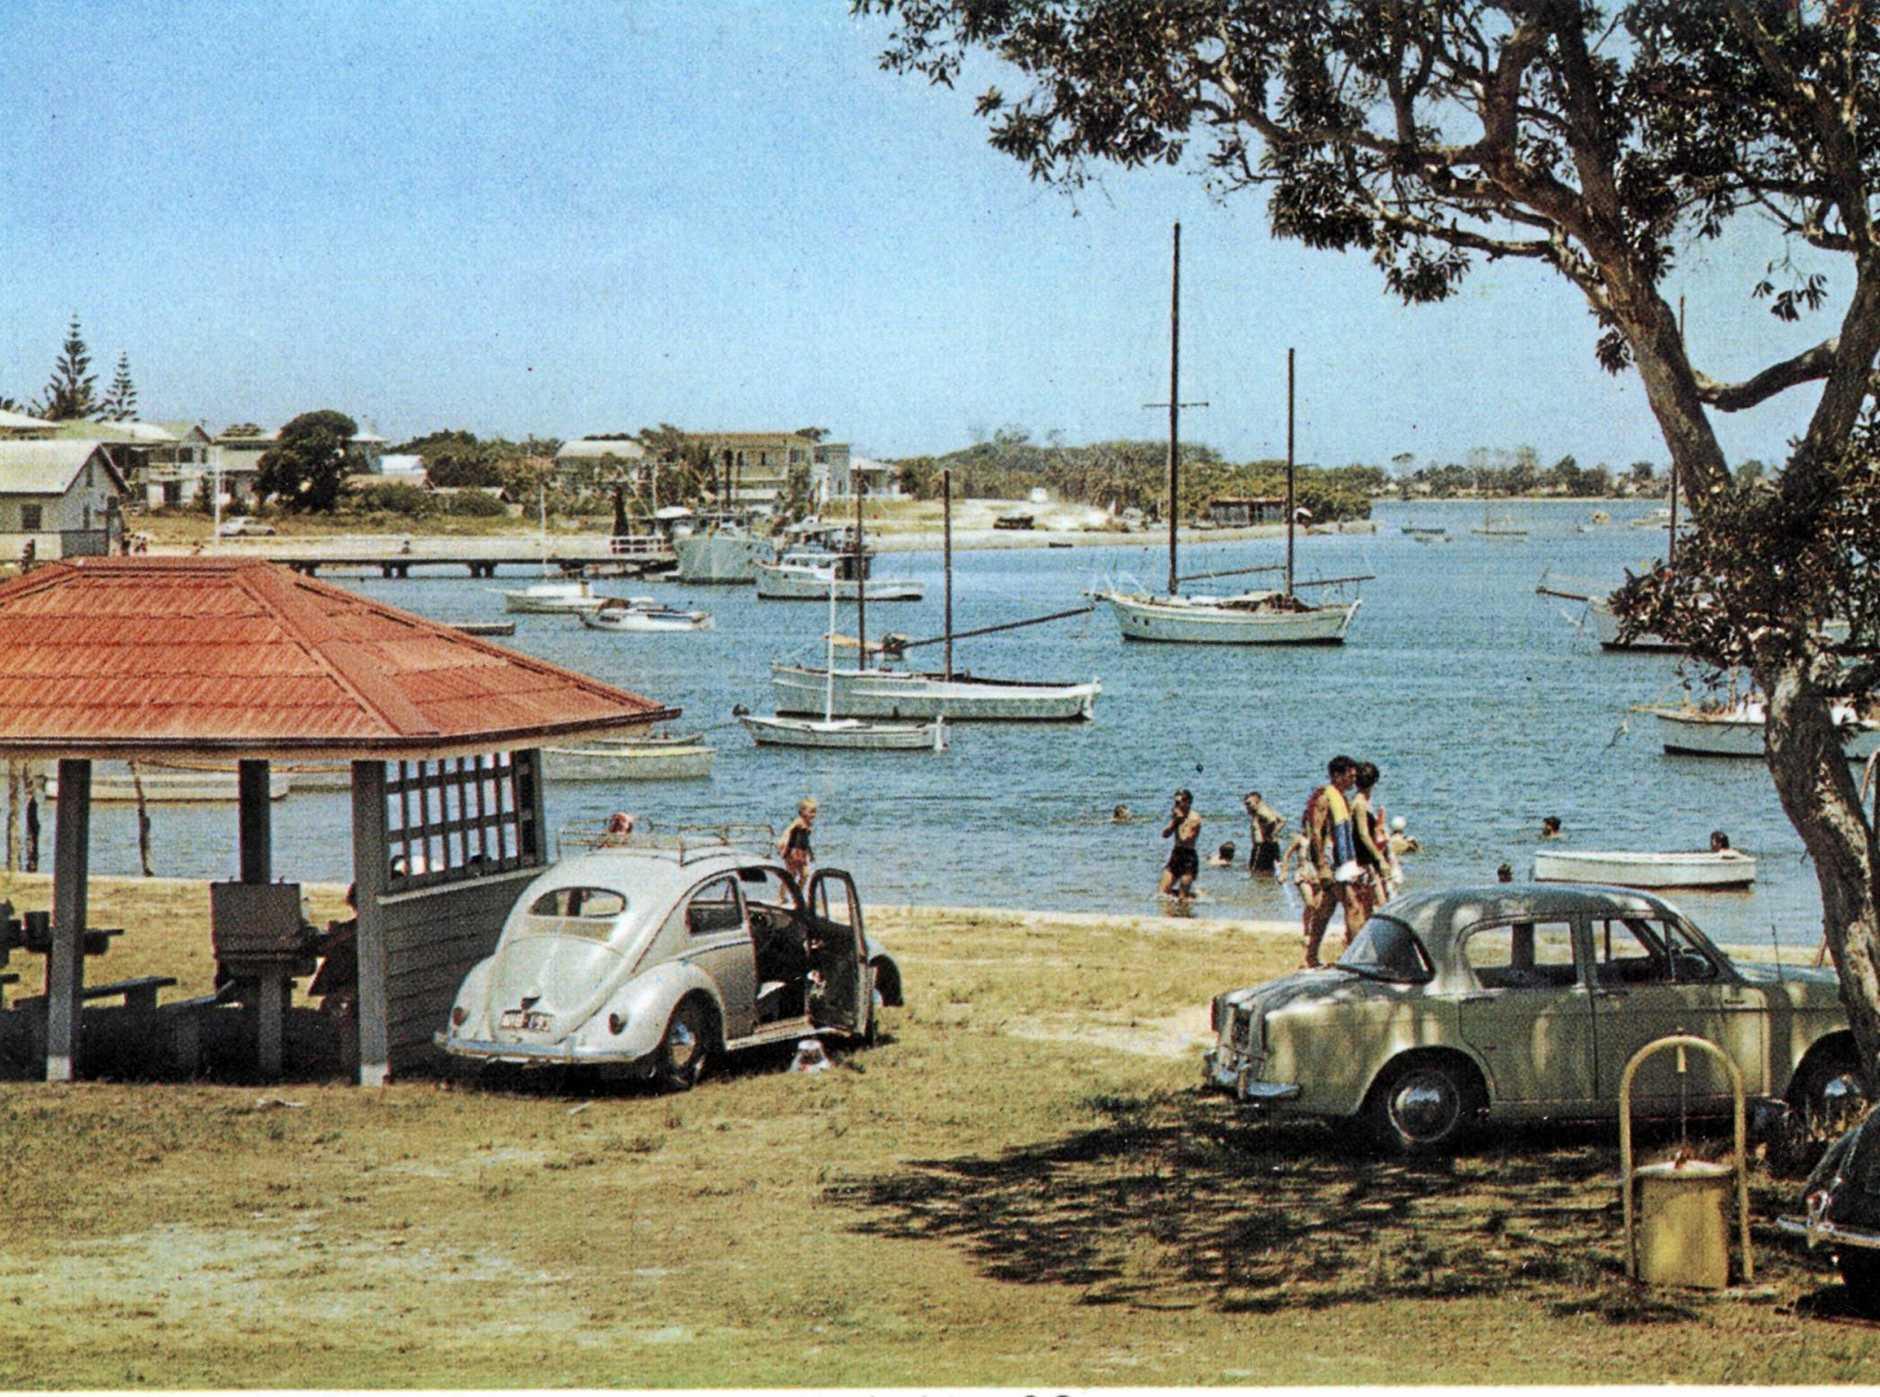 ANYONE FOR A PICNIC?: Mooloolah River and picnic reserve, Mooloolaba, ca 1960.